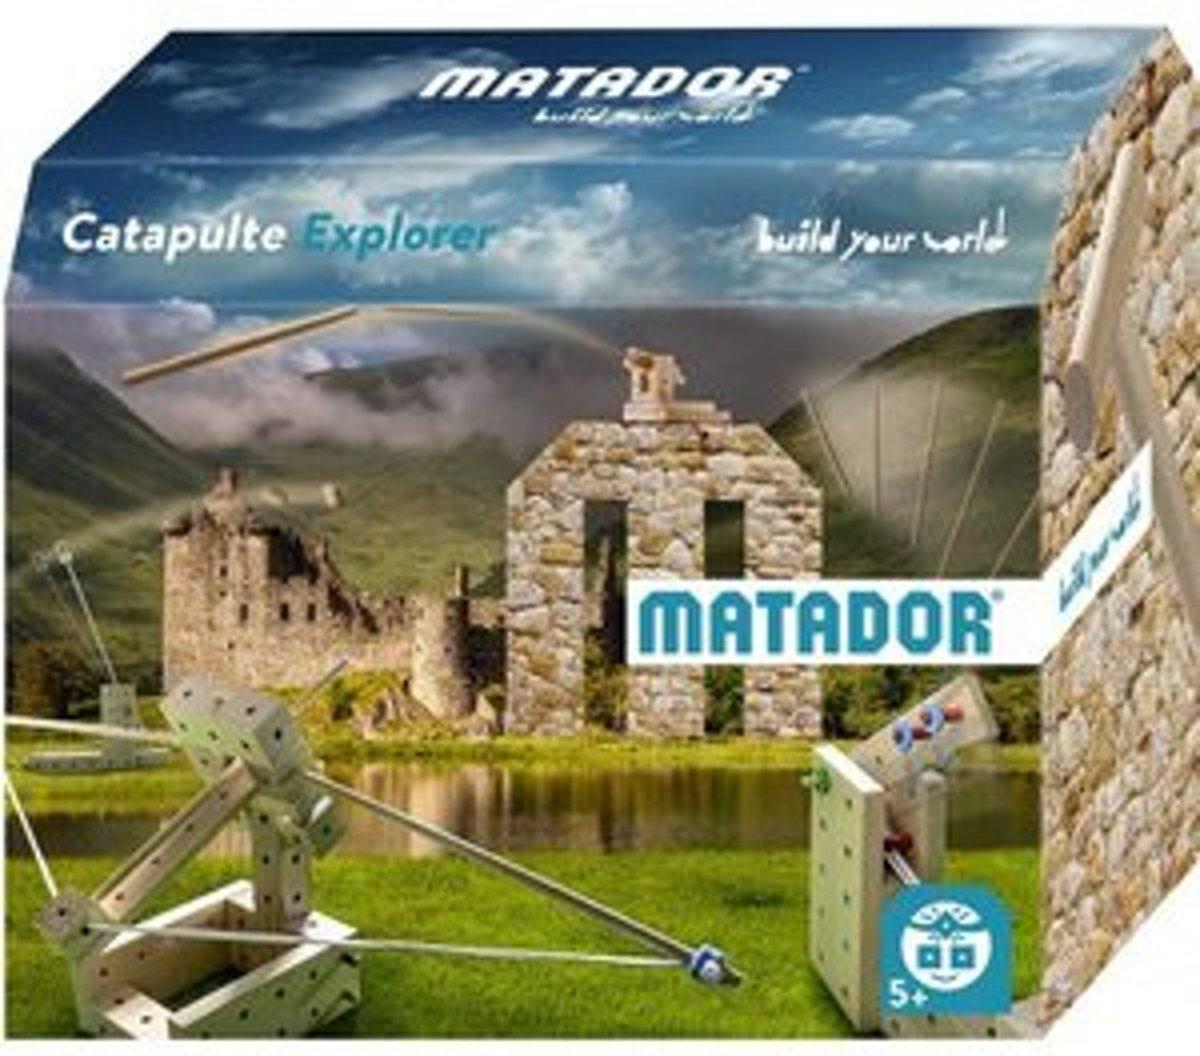 Matador Explorer 5+ Katapulten Bouwdoos